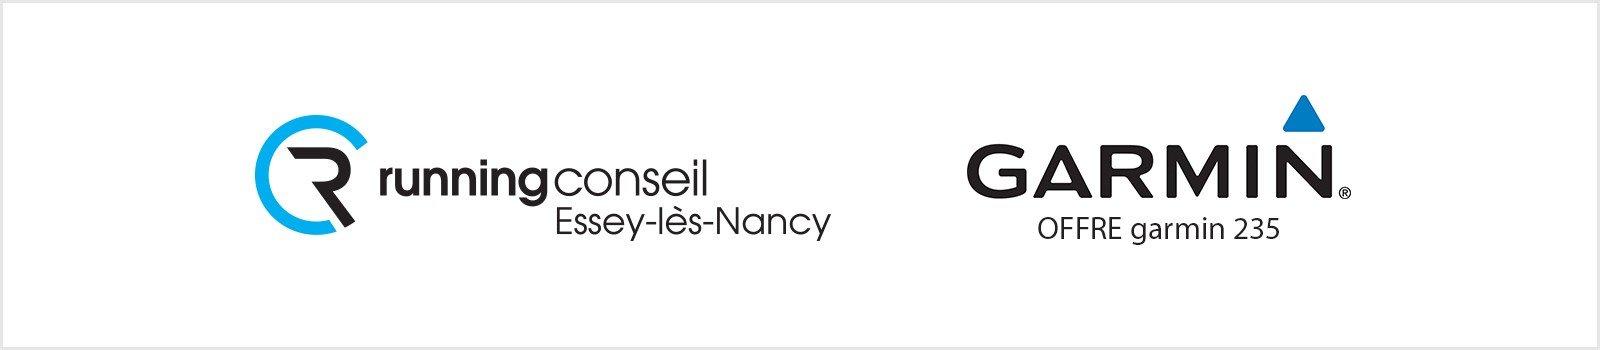 OFFRE garmin 235 RUNNING CONSEIL Essey-les-nancy